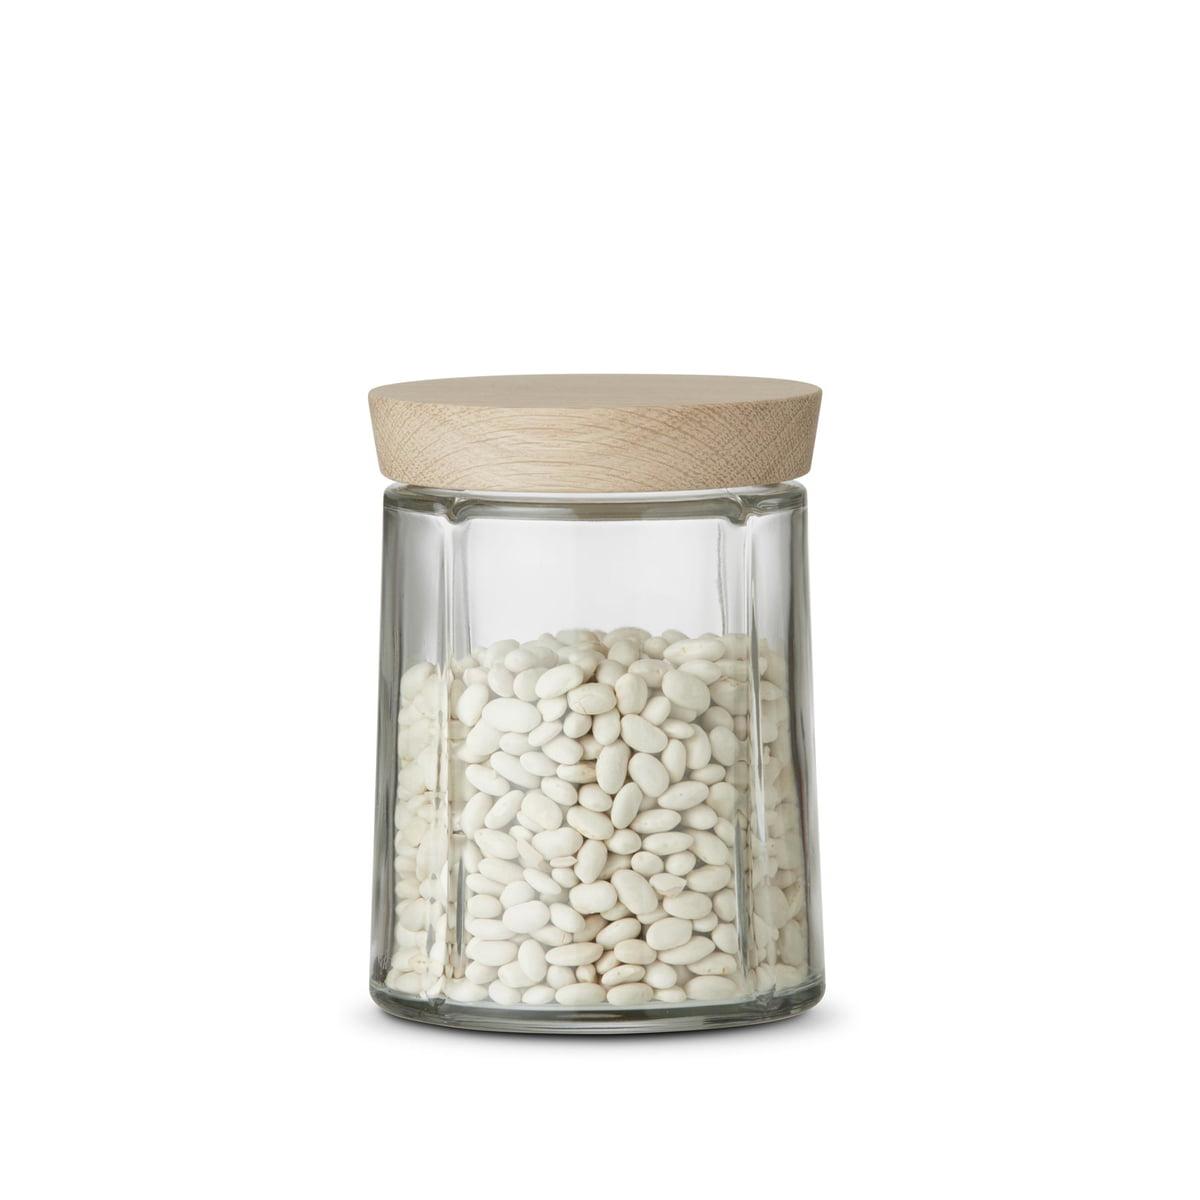 Rosendahl - Grand Cru bocaux en verre / chêne, 0,75 litre